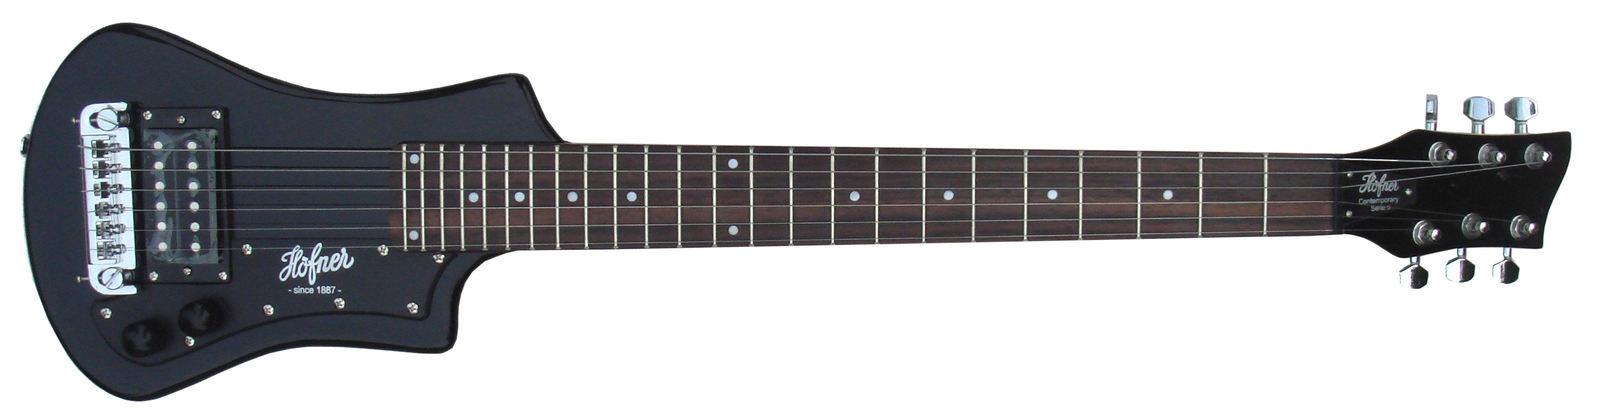 HOFNER HCT-SH-BL SHORTY TRAVEL Electric Guitar BLACK with Gig Bag